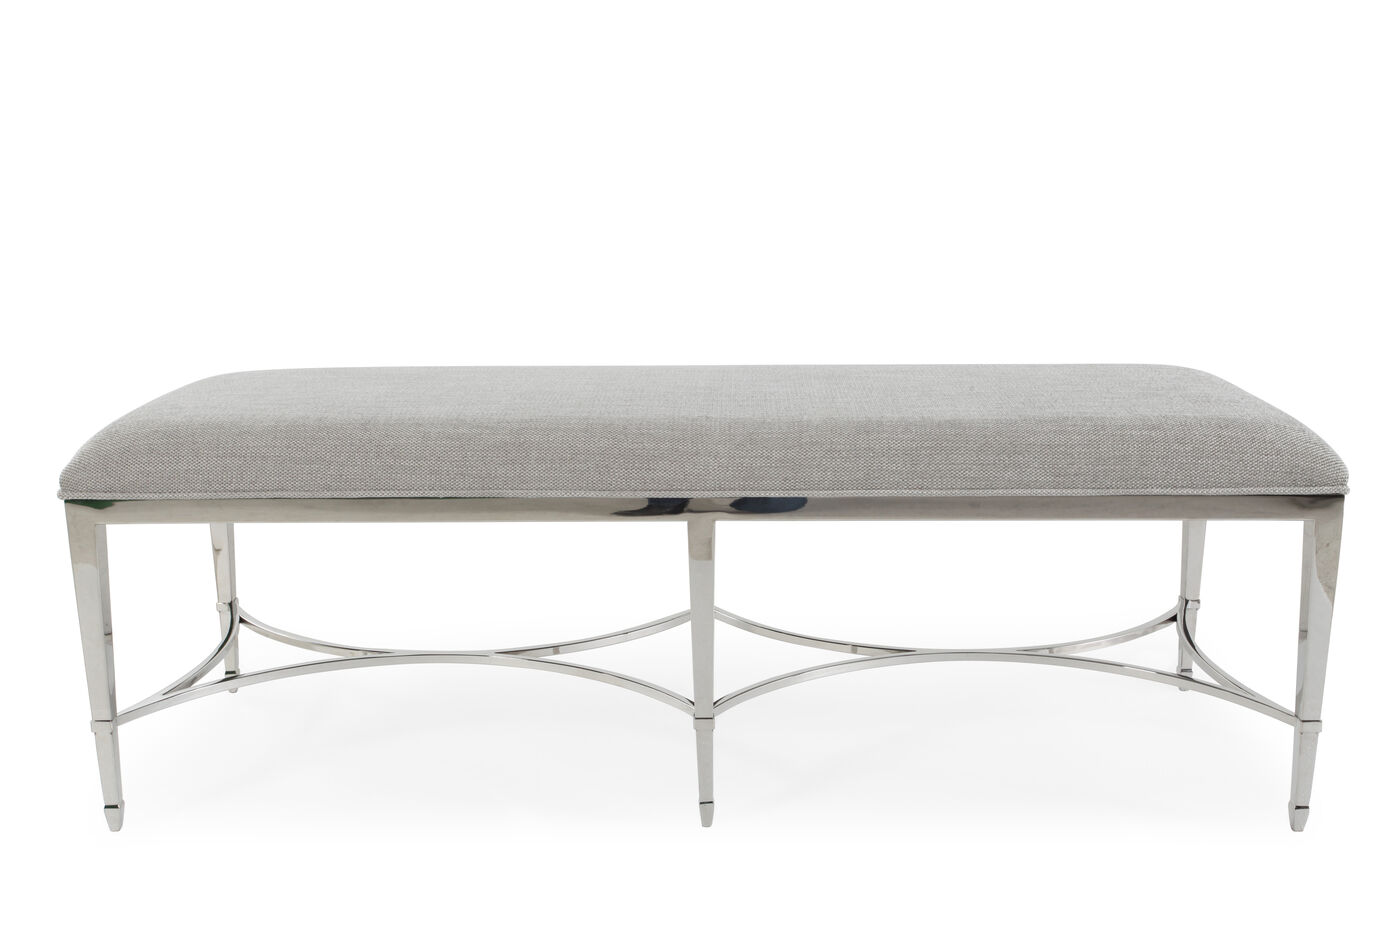 boretti catalog steel valentino colors style of presentation product angles bench